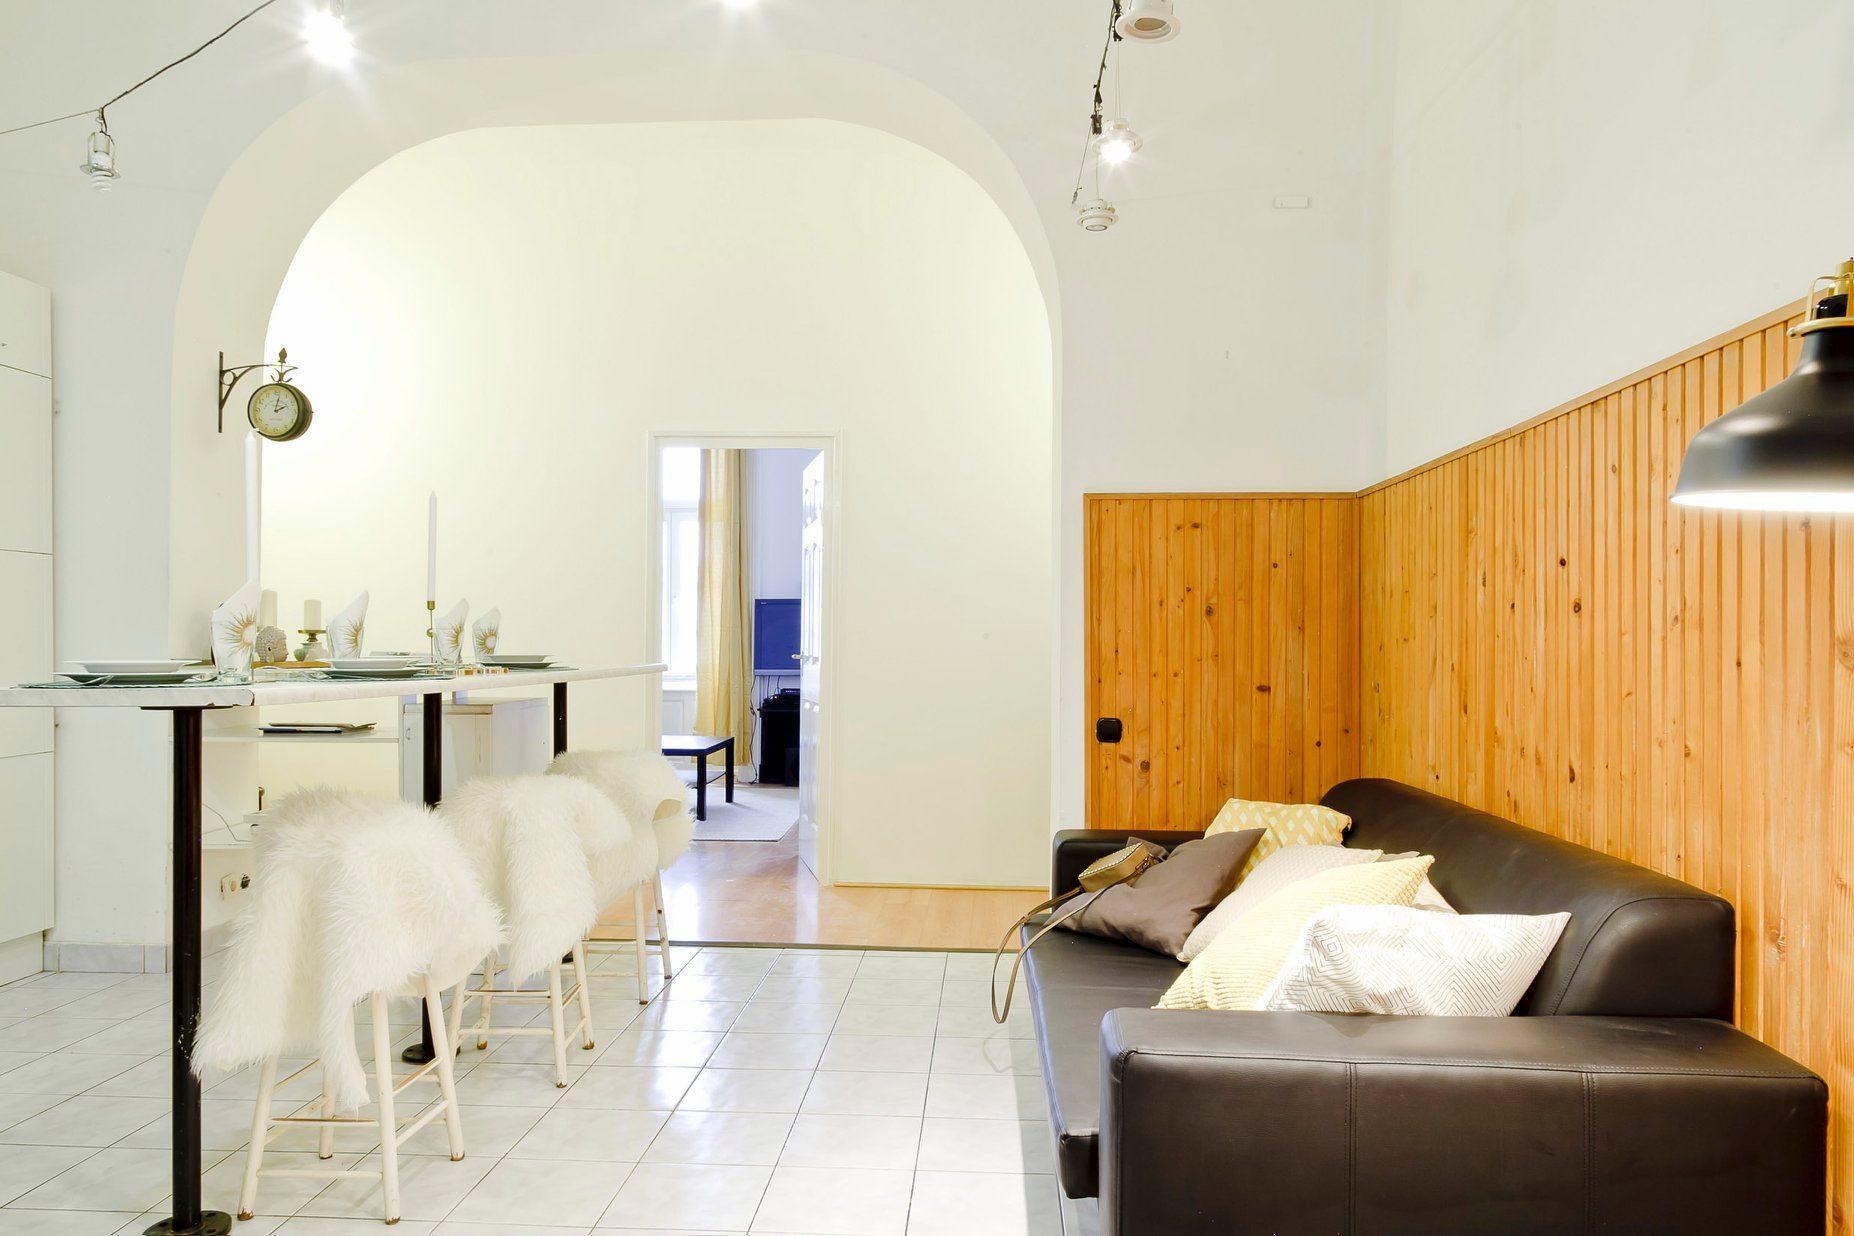 Harsfa - Private furnished room Budapest